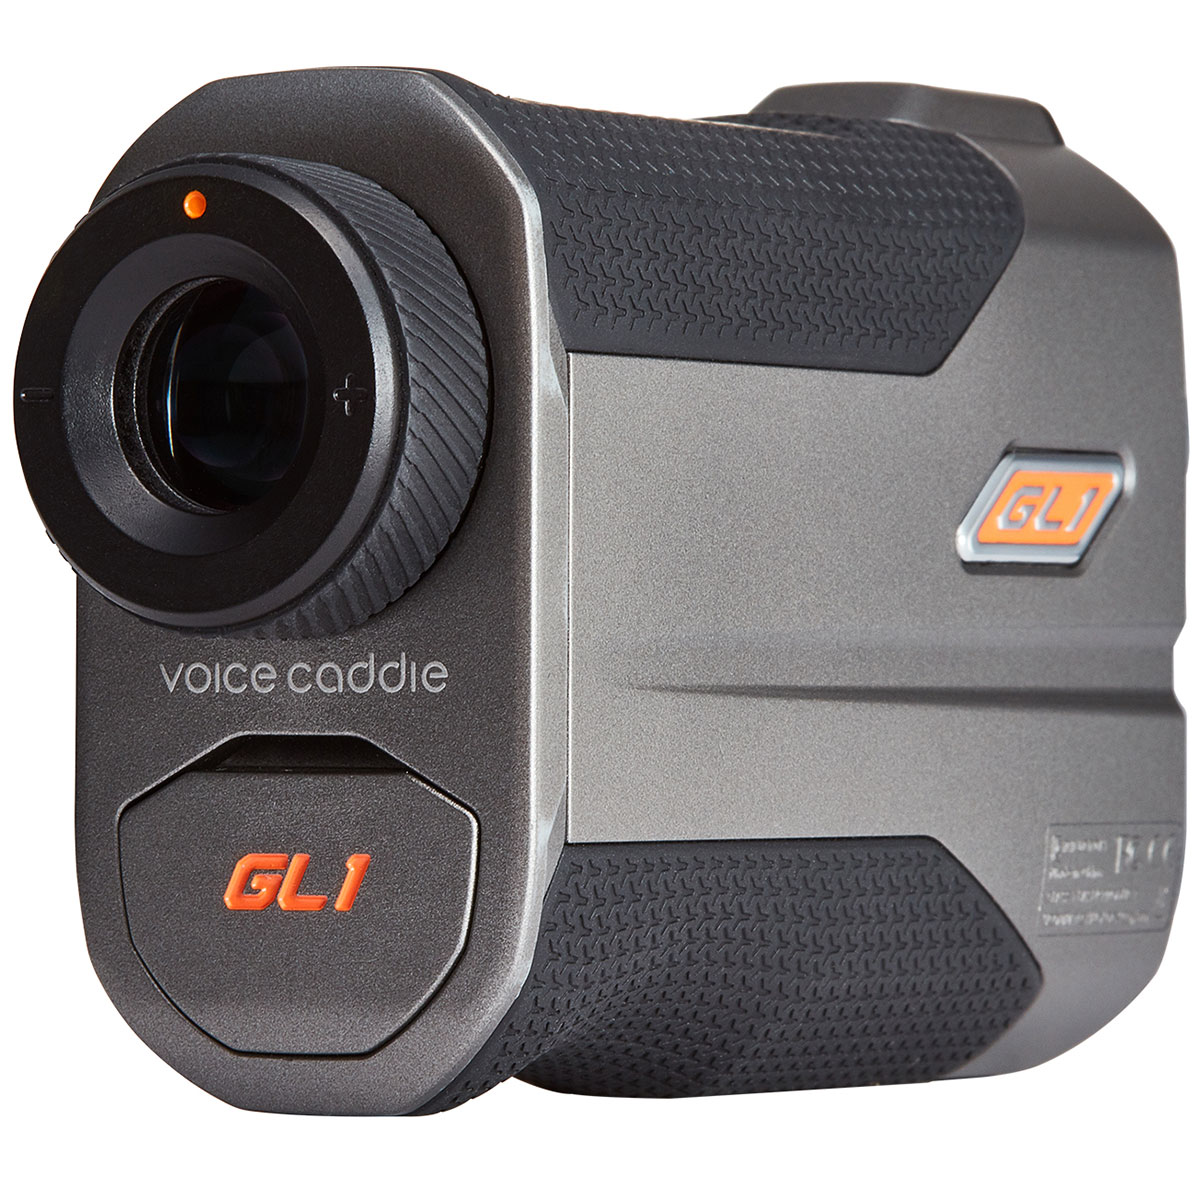 GL1 GPS搭載 レーザー照準タイプ 距離測定器